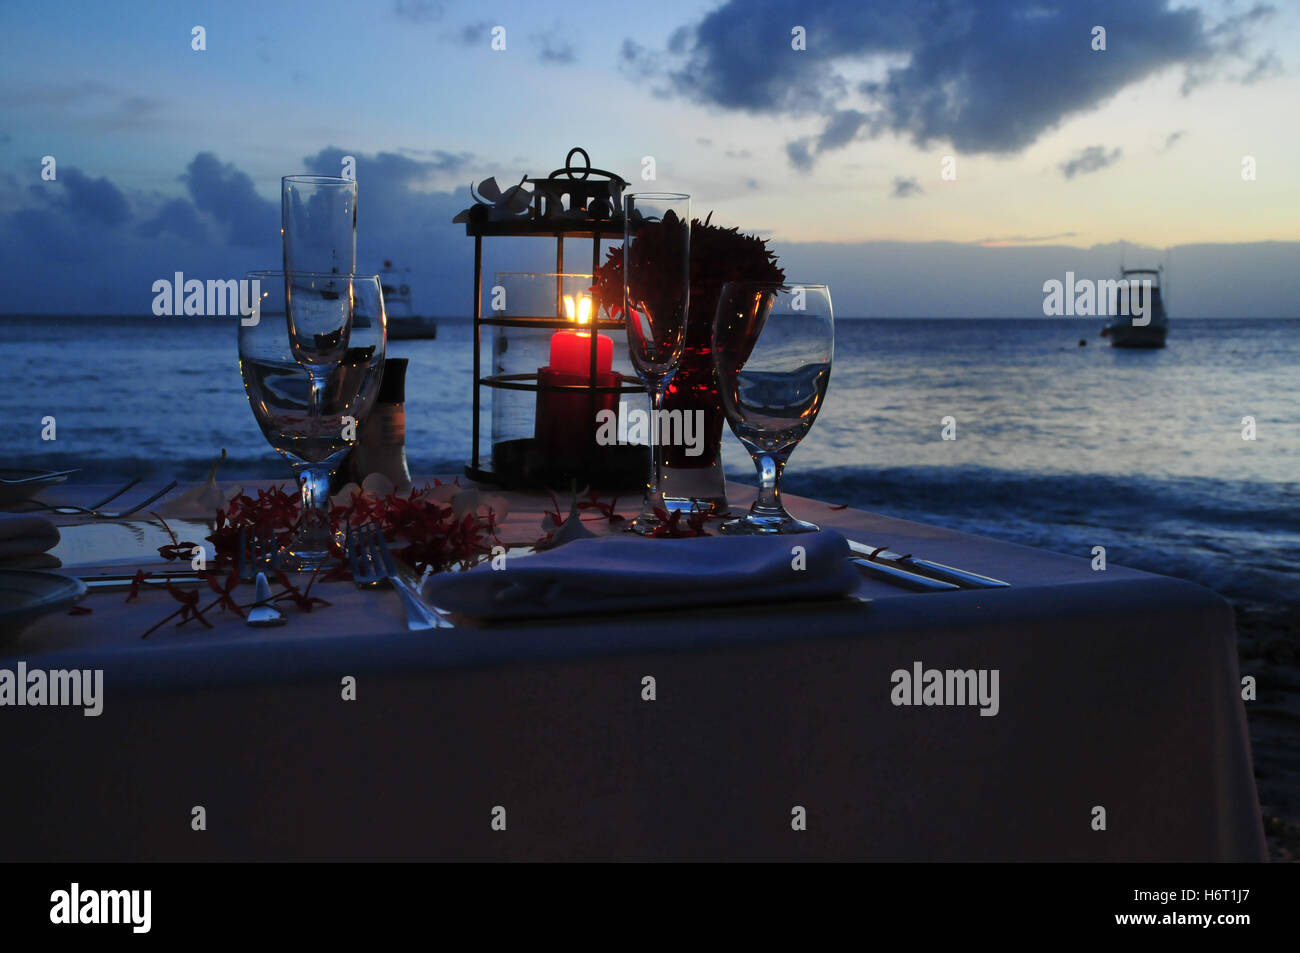 Strand Meer Küste Romantik Karibik verprasst Abfall Strandrestaurant bar Taverne Urlaub Urlaub Ferien Stockbild